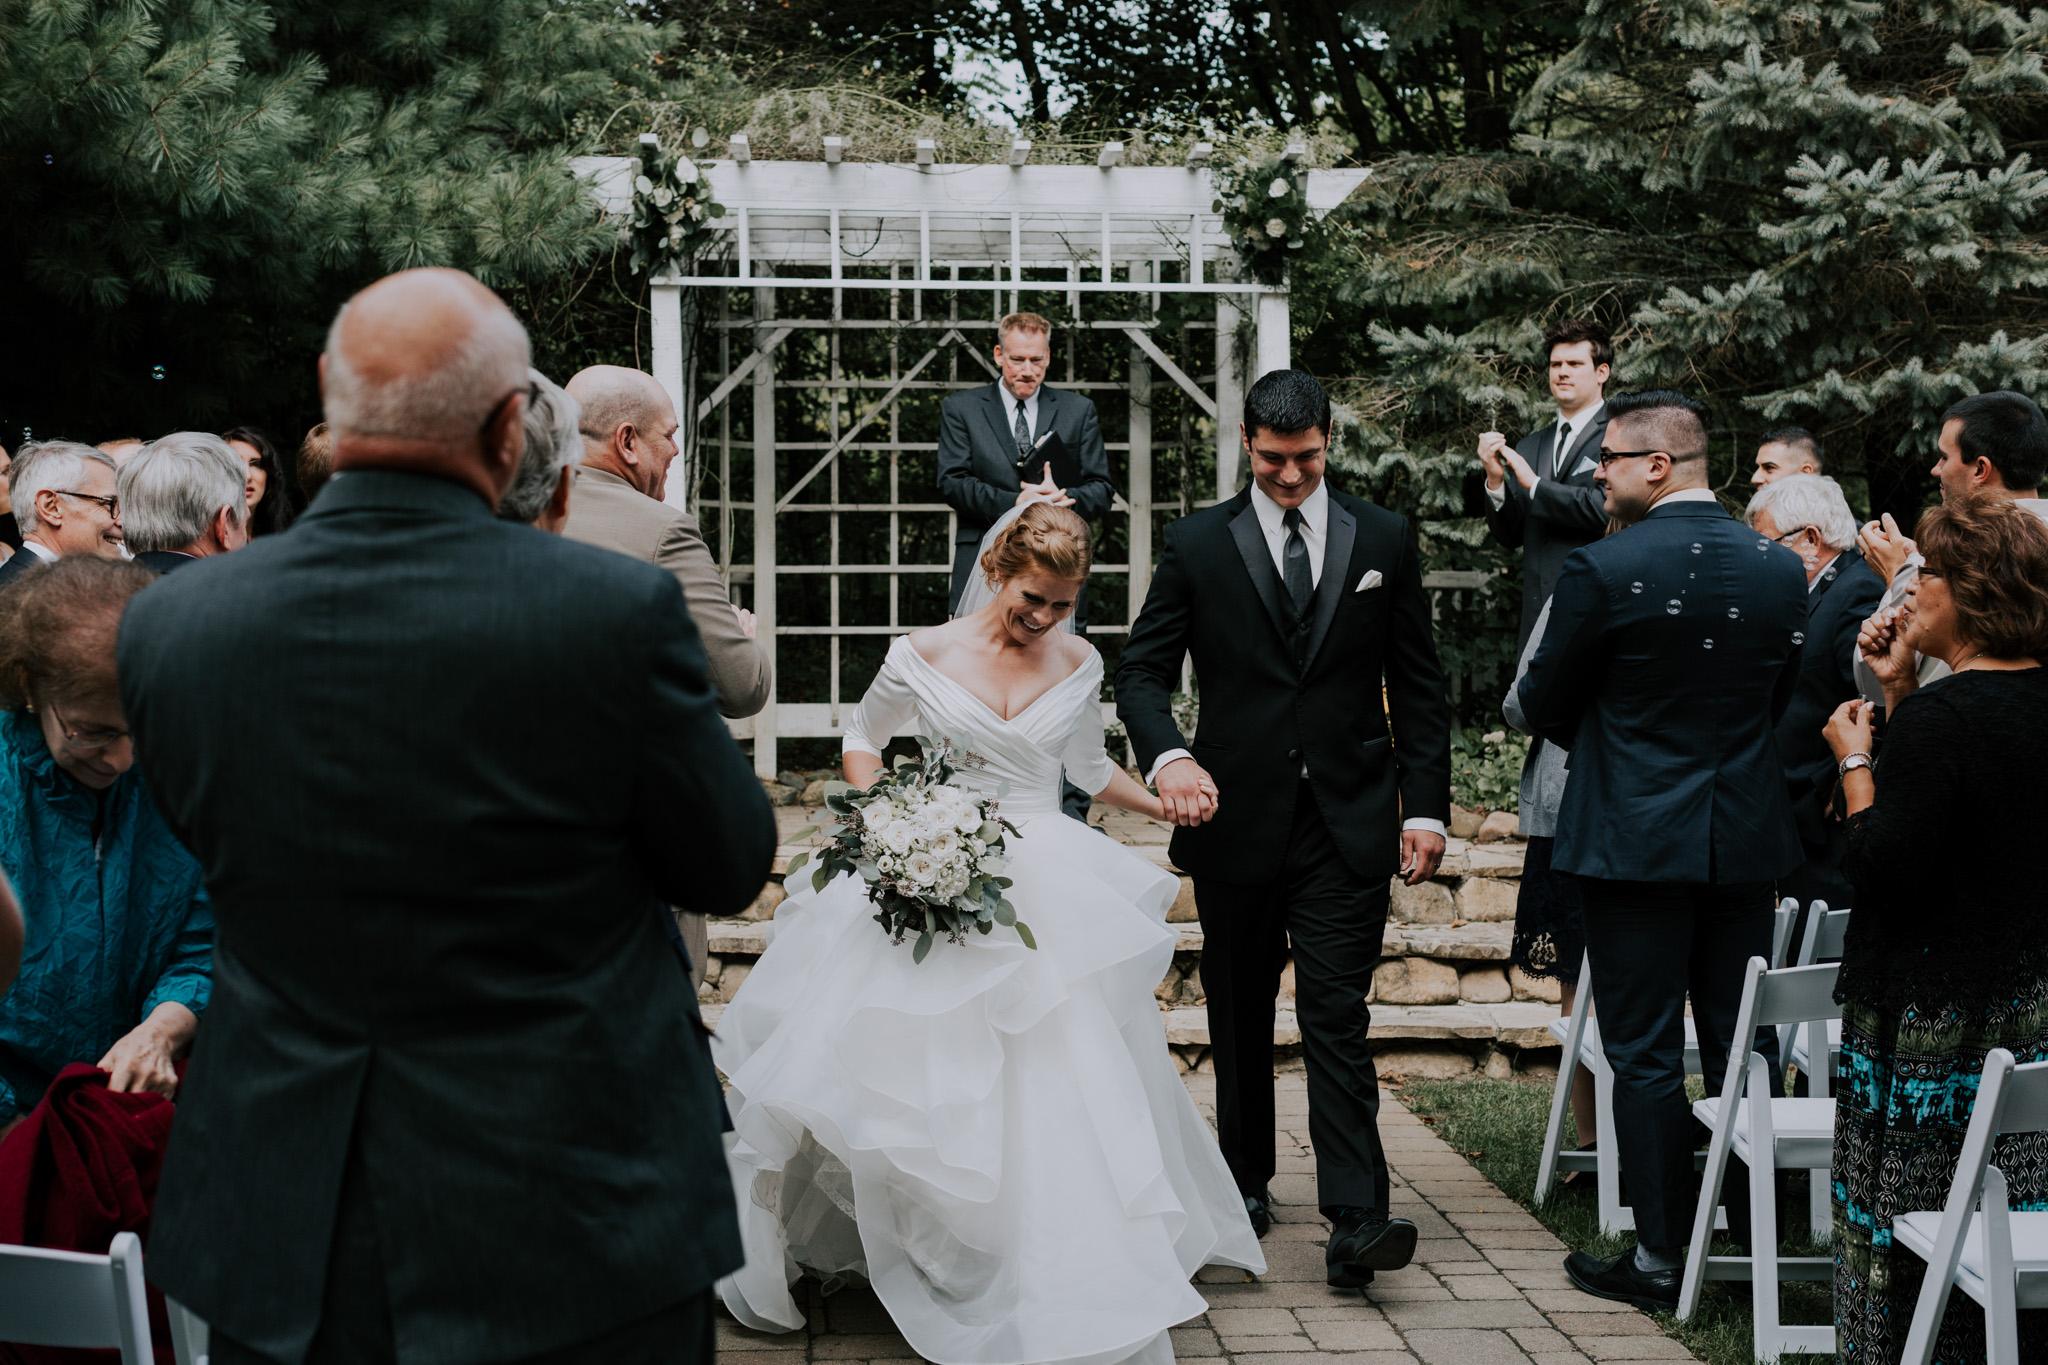 MillCreek-Wilde-Wedding-Barn-Michigan-Eliza-Eric-Vafa-Photo688.jpg